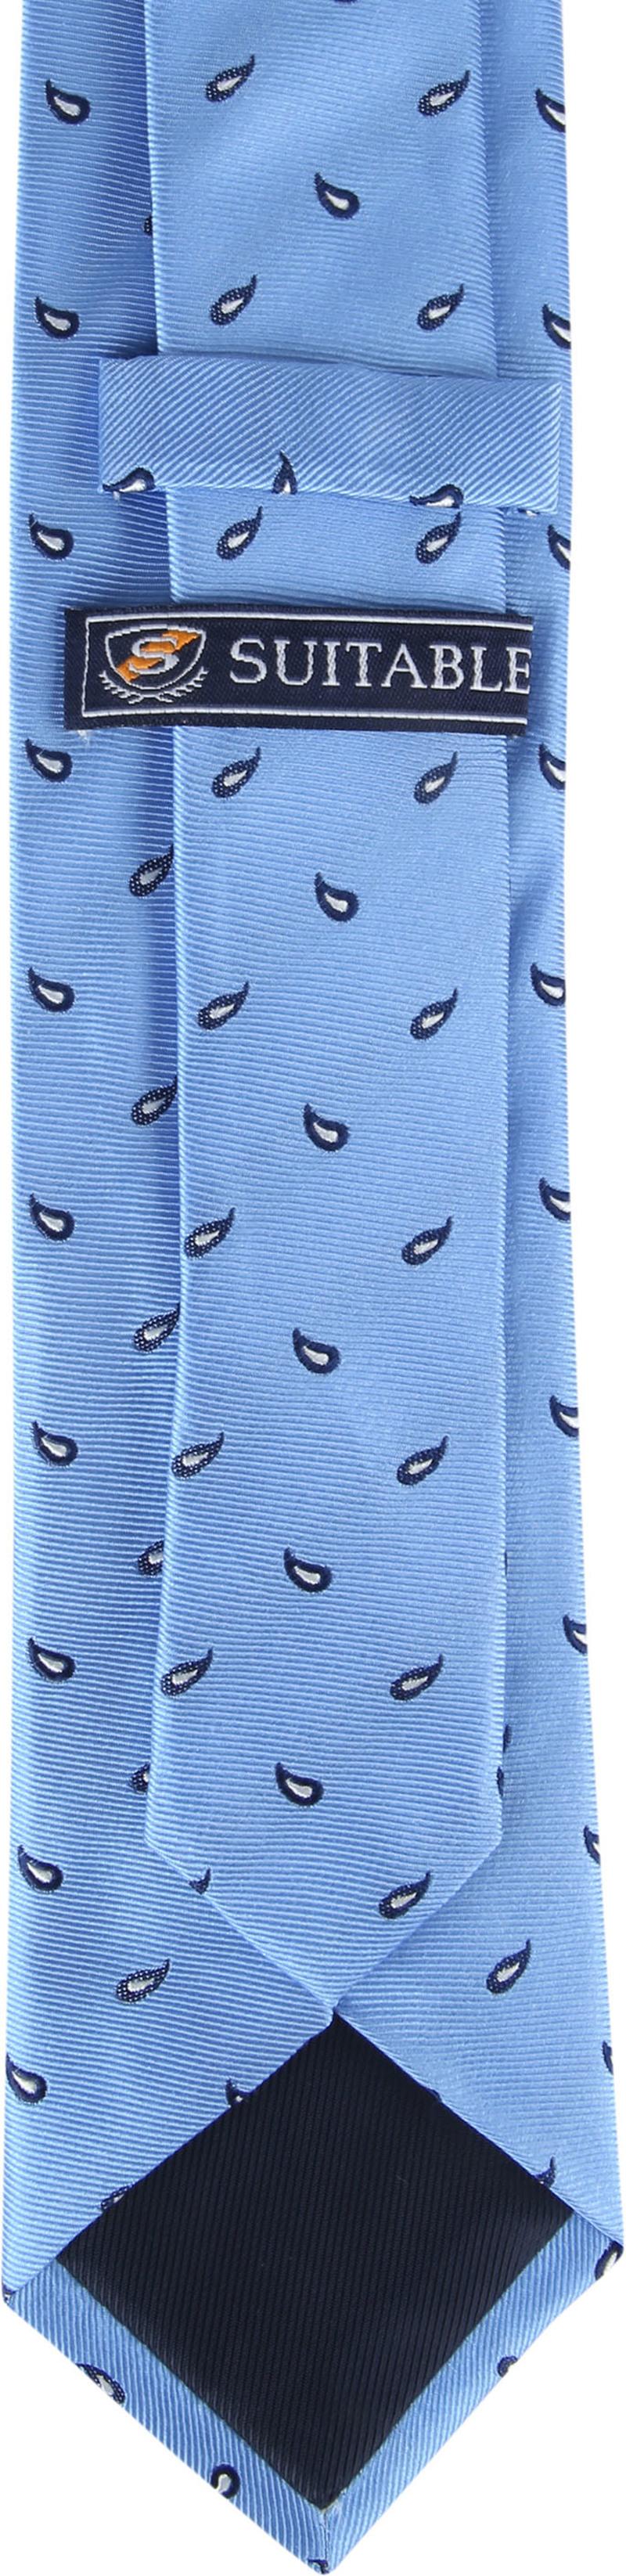 Suitable Tie Twill Paisley Blue photo 2